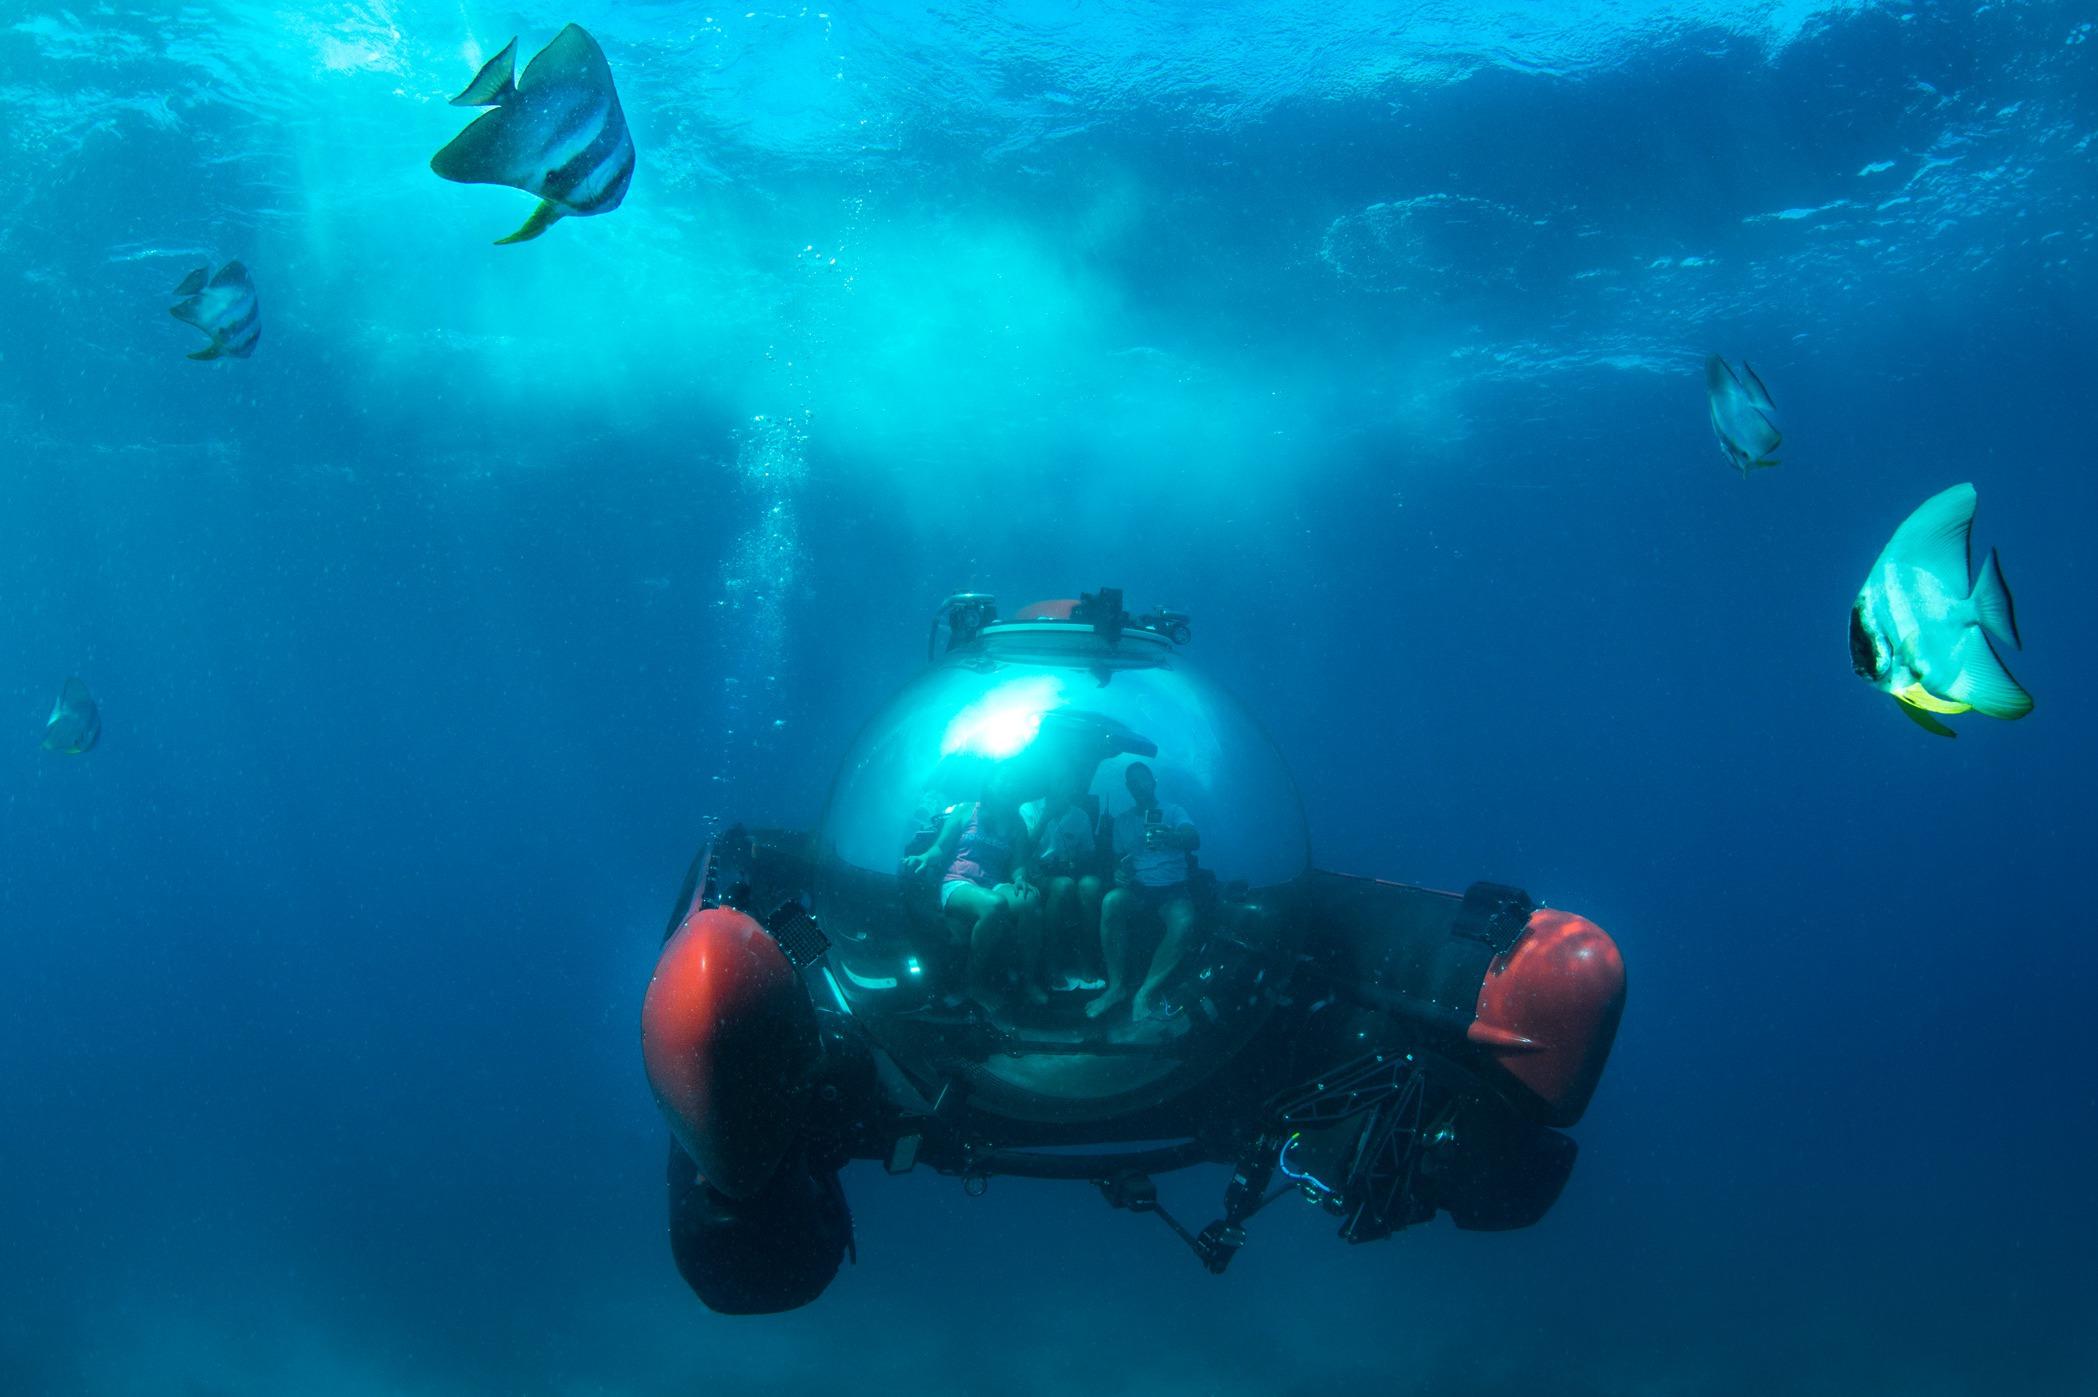 Crystal Cruises - Crystal Esprit submersible underwater